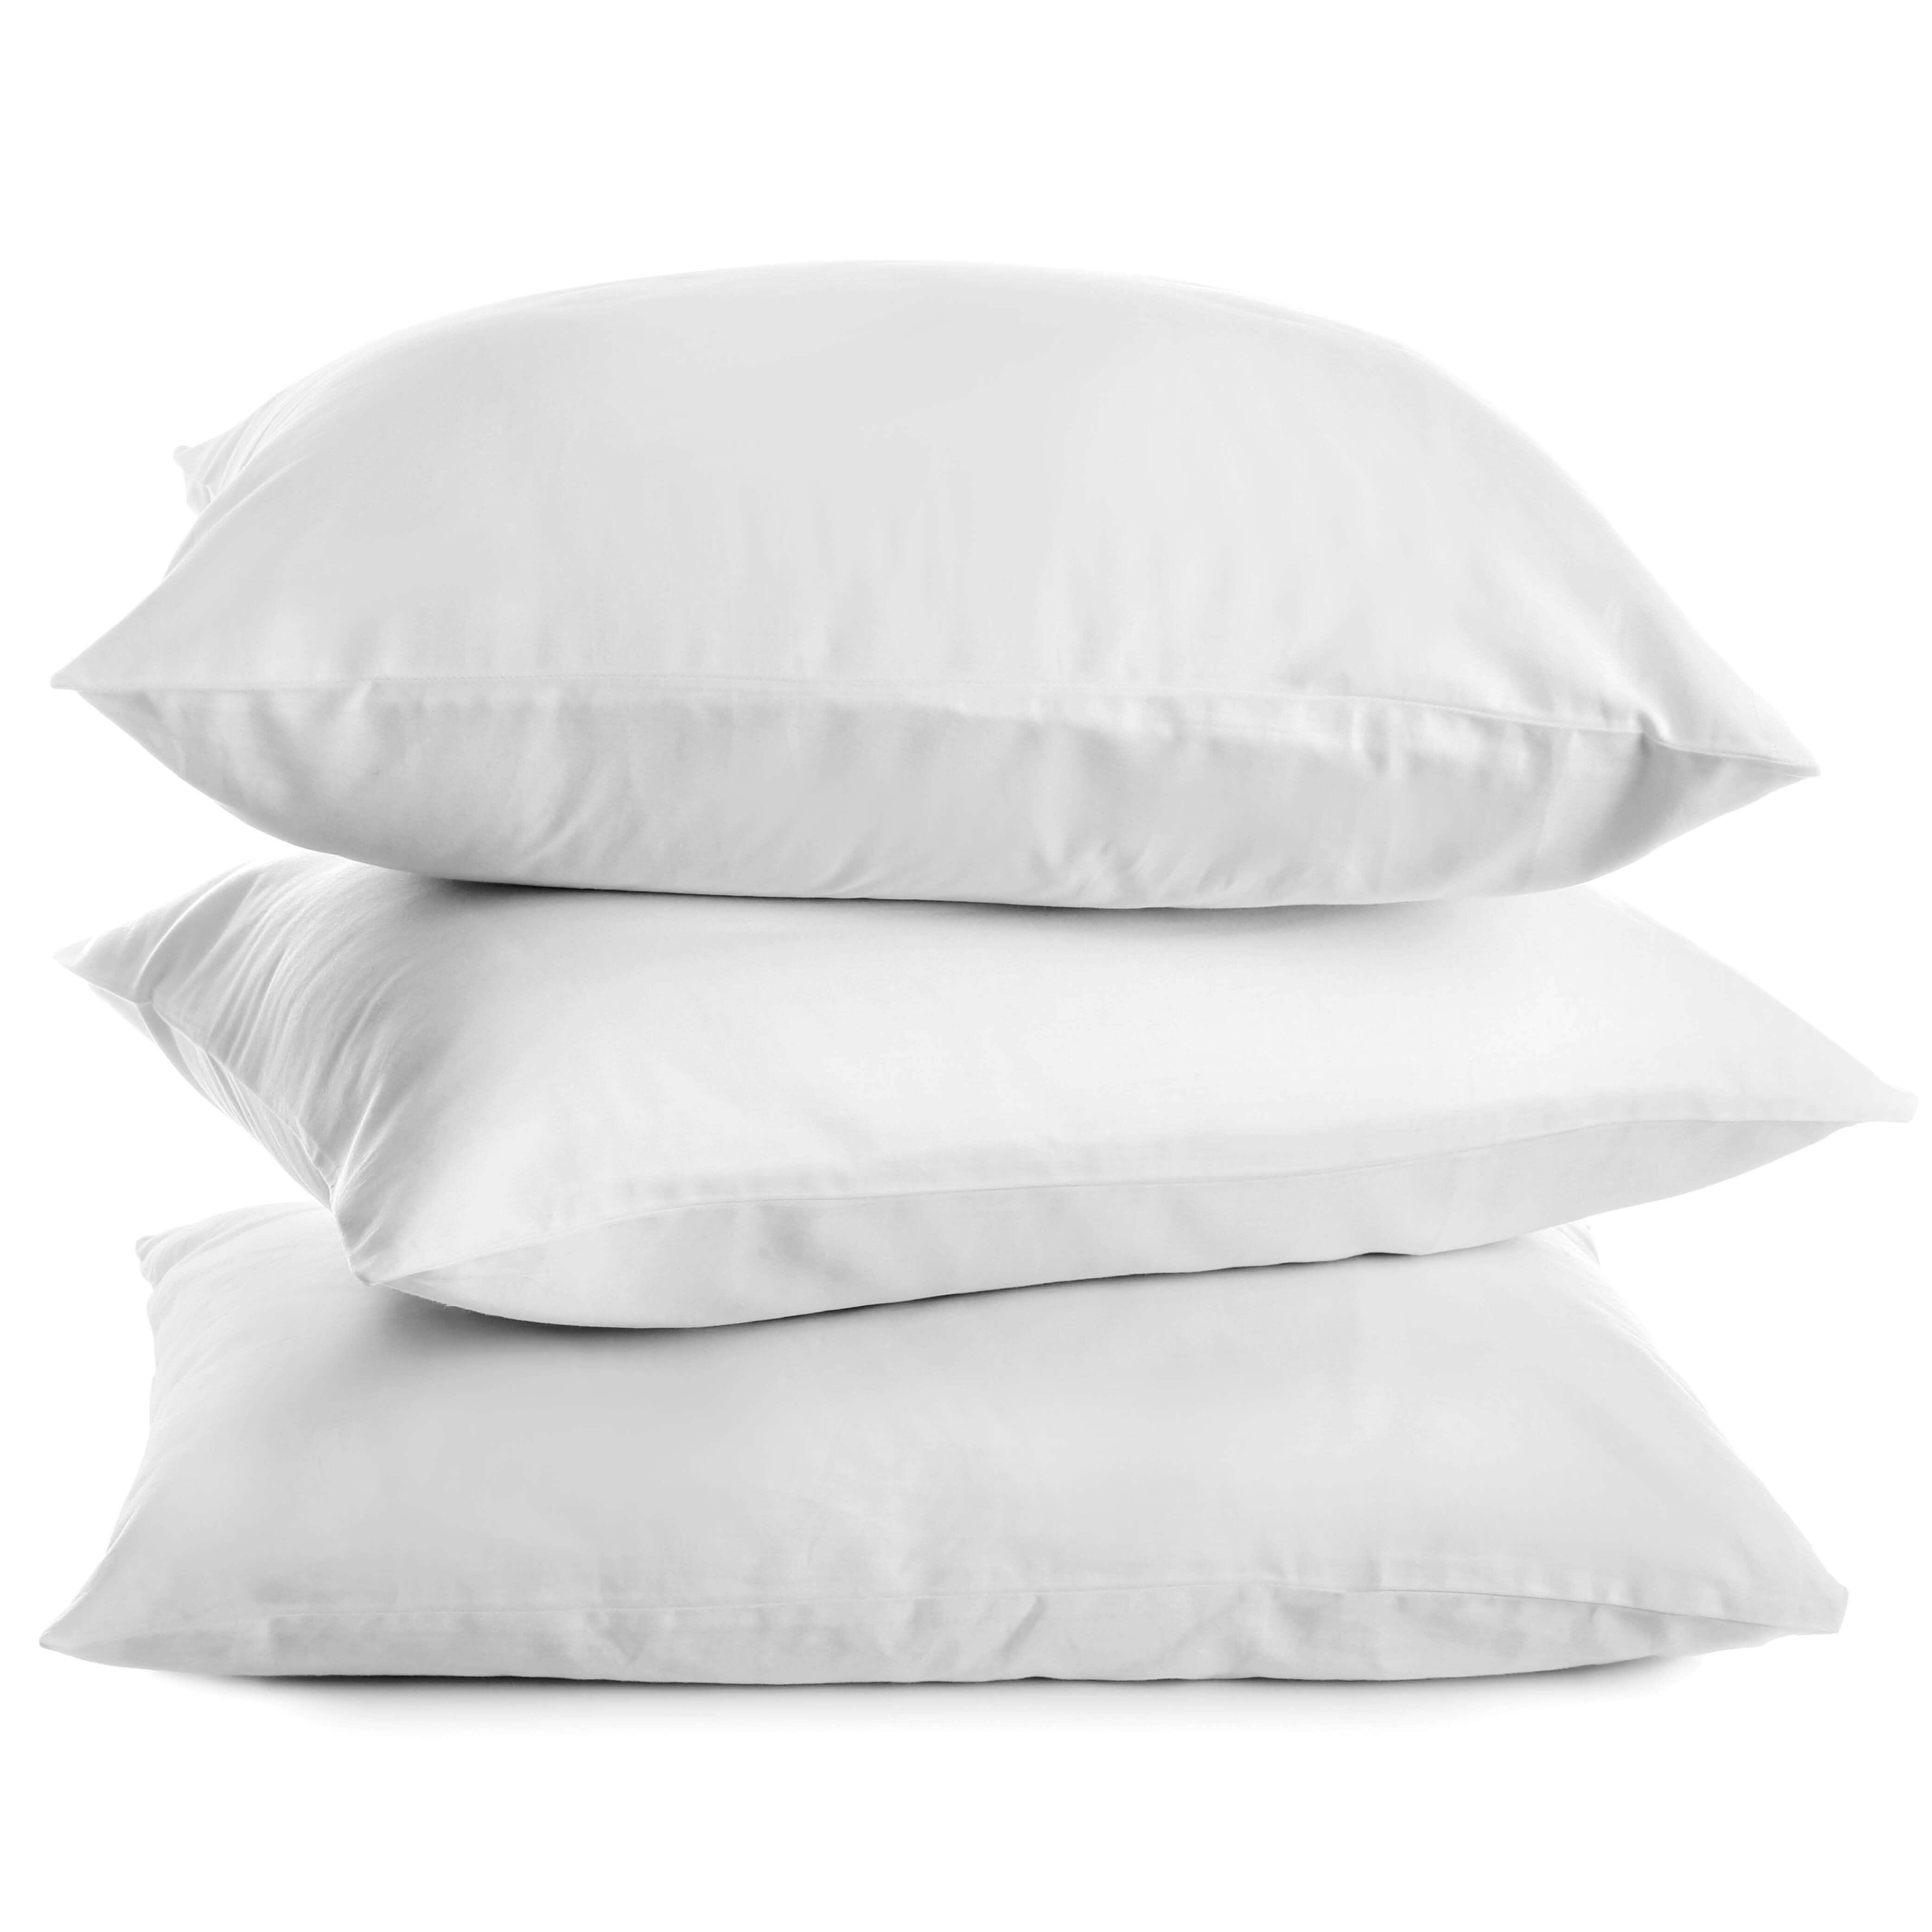 Taie d'oreiller en satin blanc pur coton SERAPHIN